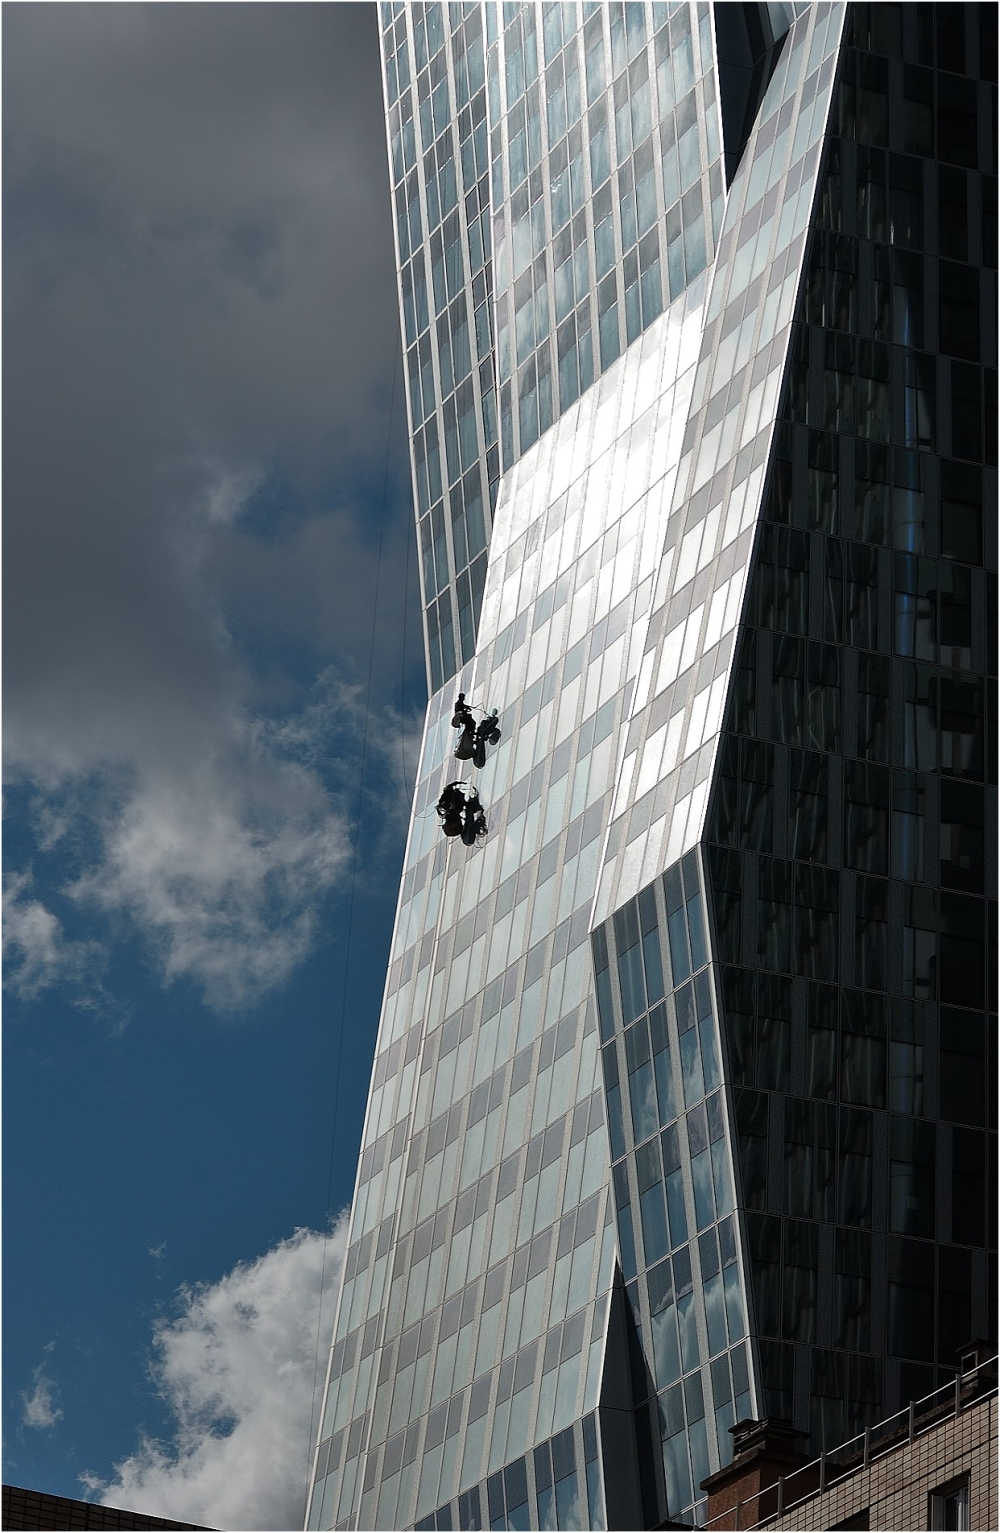 Technicien de surface roger dekert vitre urbain